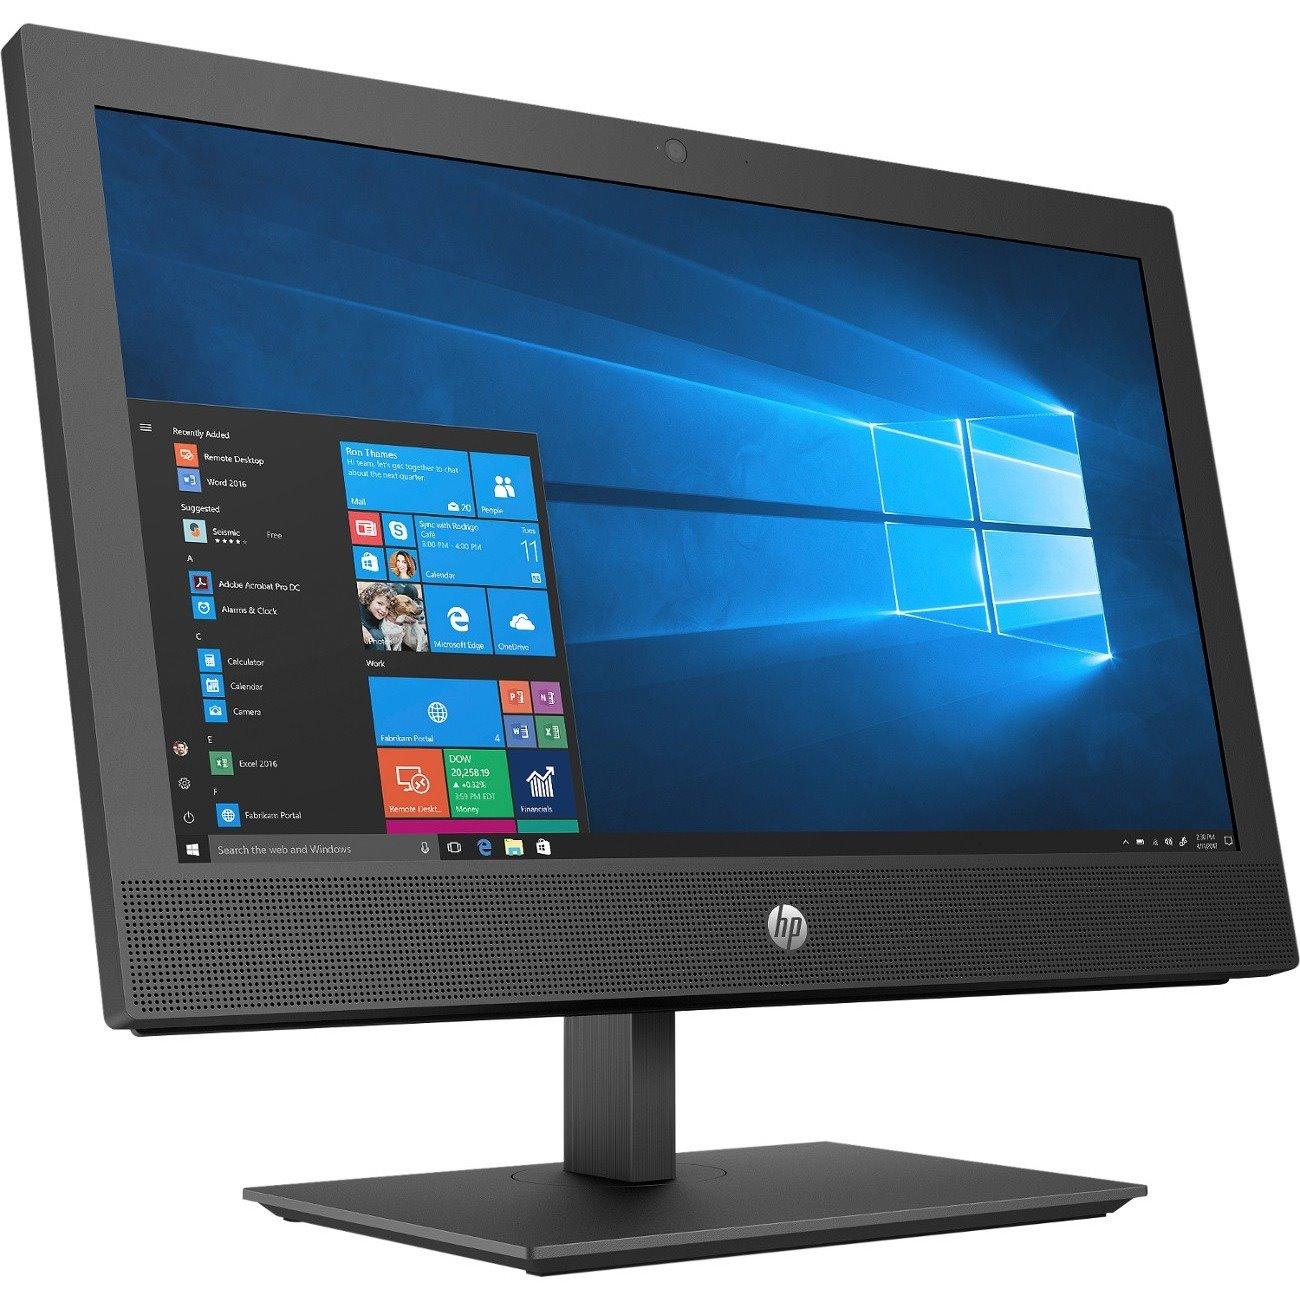 "HP Business Desktop ProOne 400 G5 All-in-One Computer - Core i3 i3-9100T - 4 GB RAM - 500 GB HDD - 50.8 cm (20"") 1600 x 900 - Desktop"